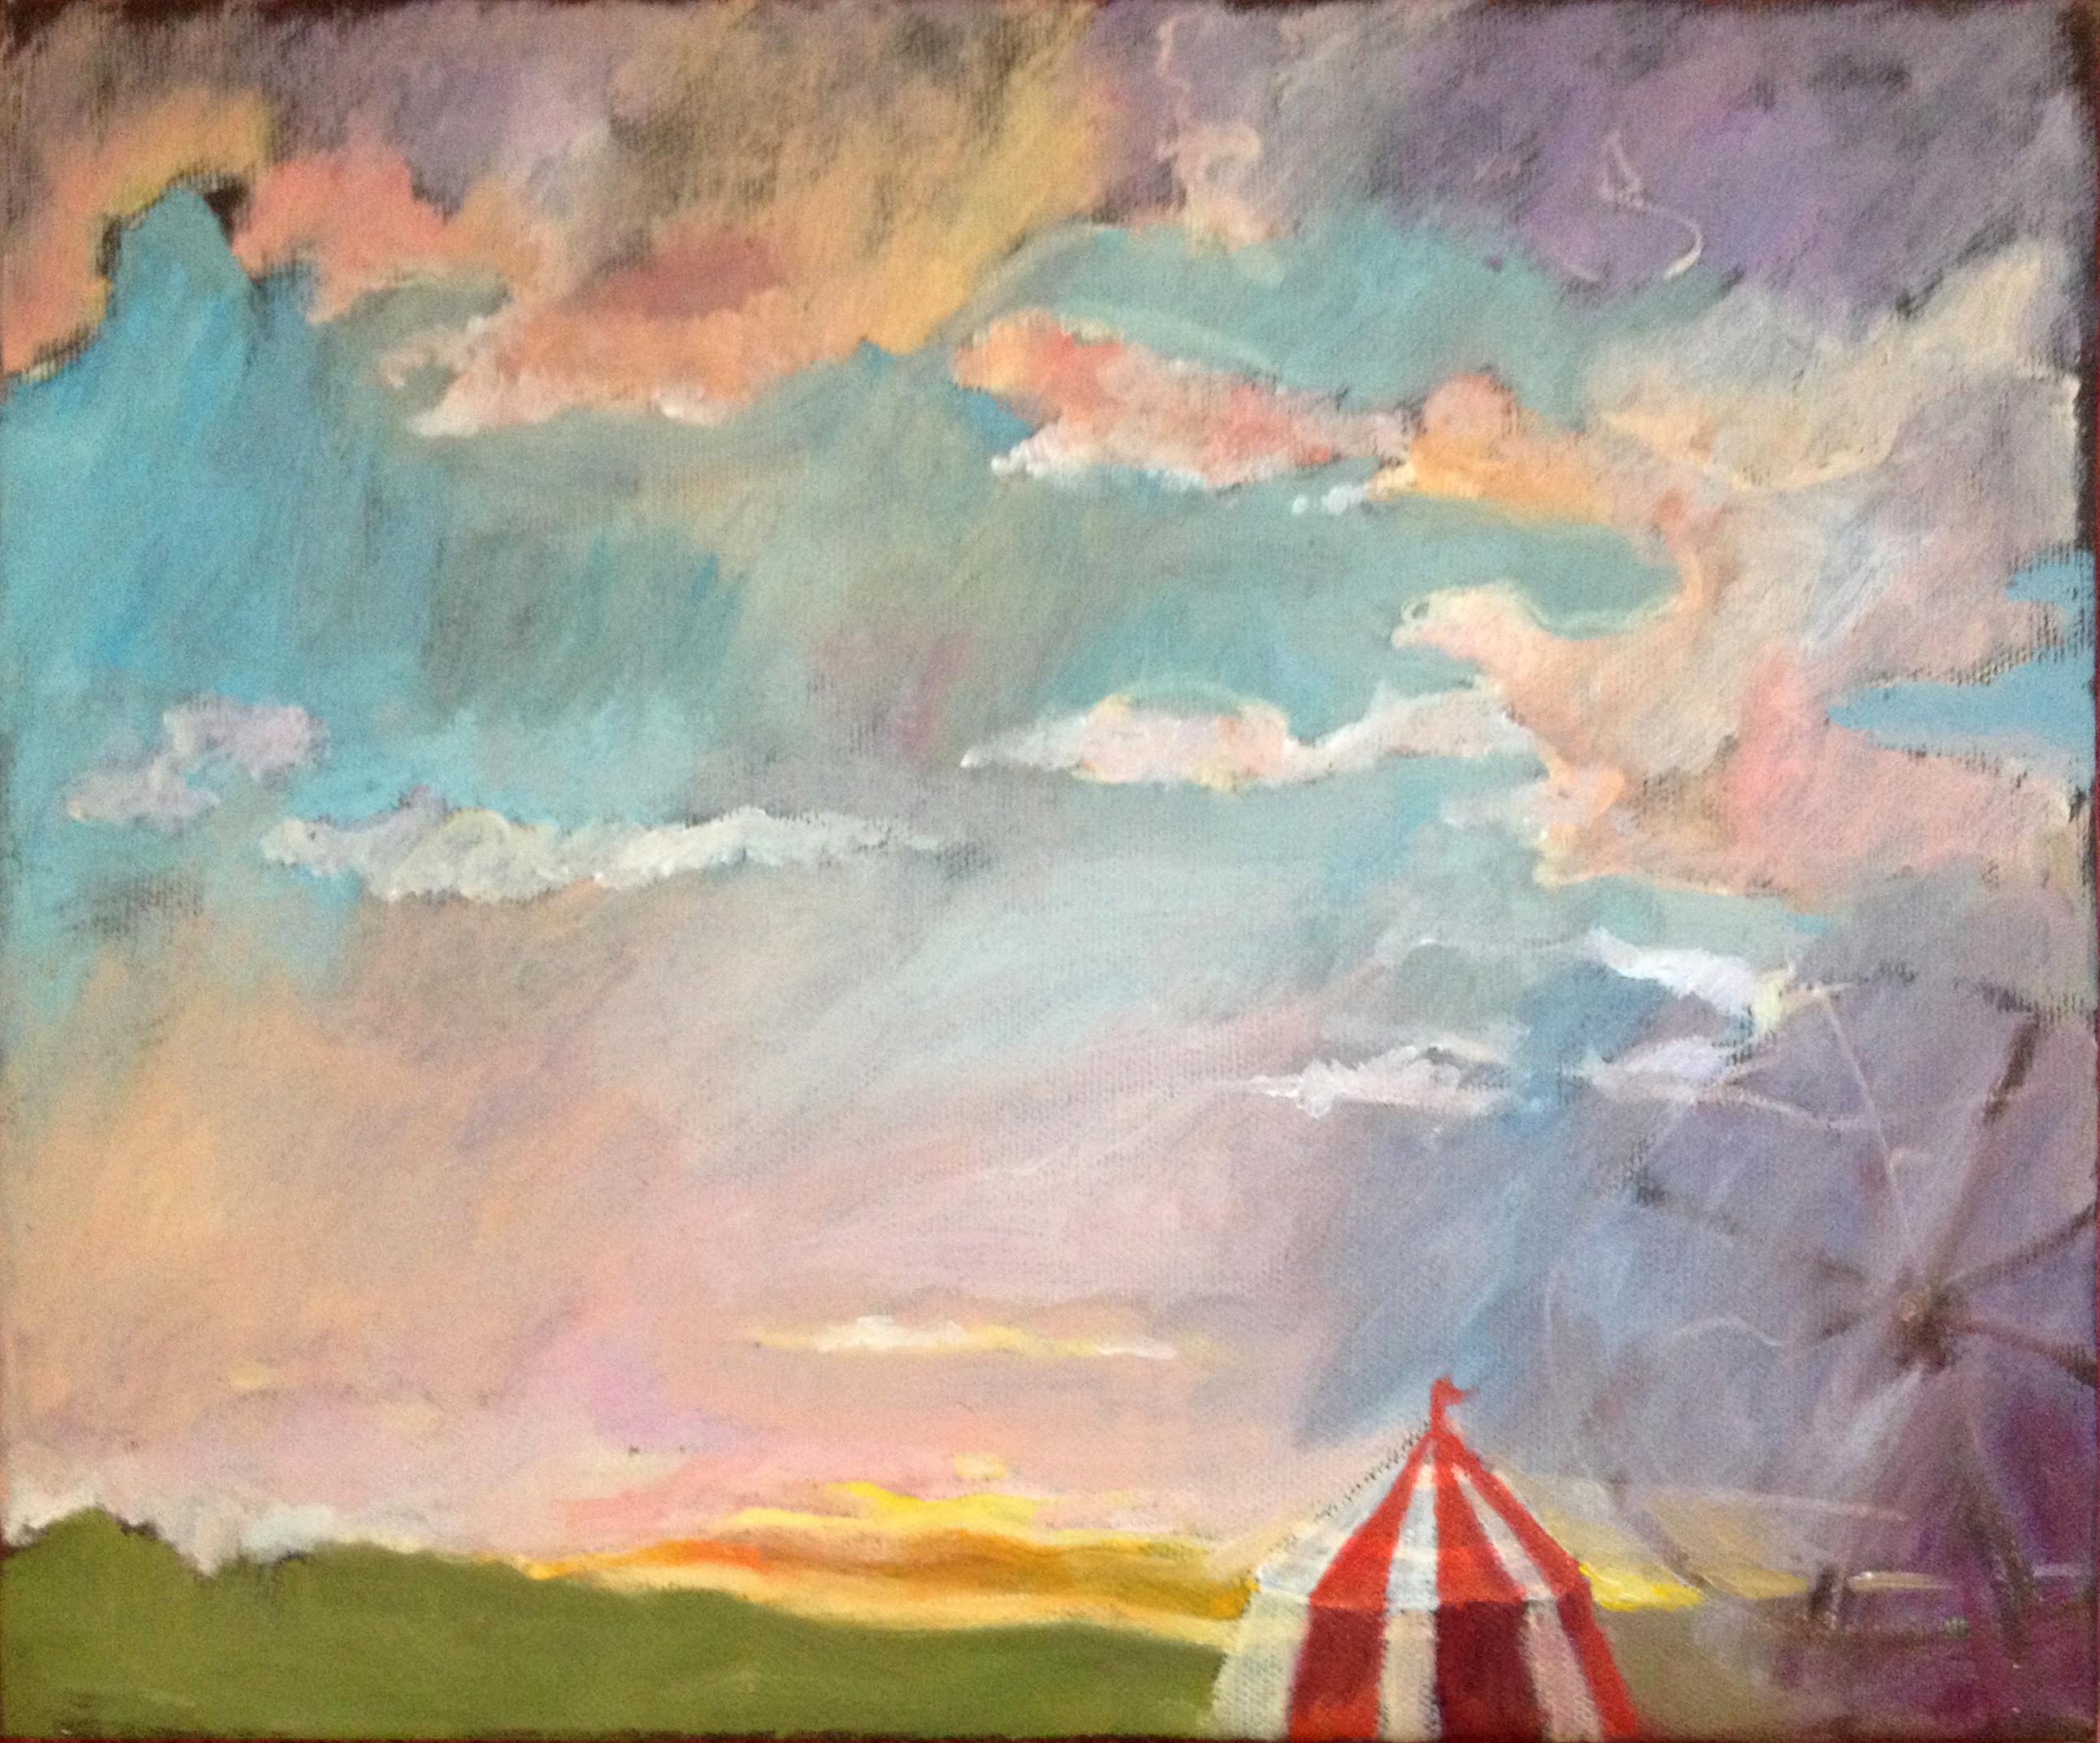 A circus landscape